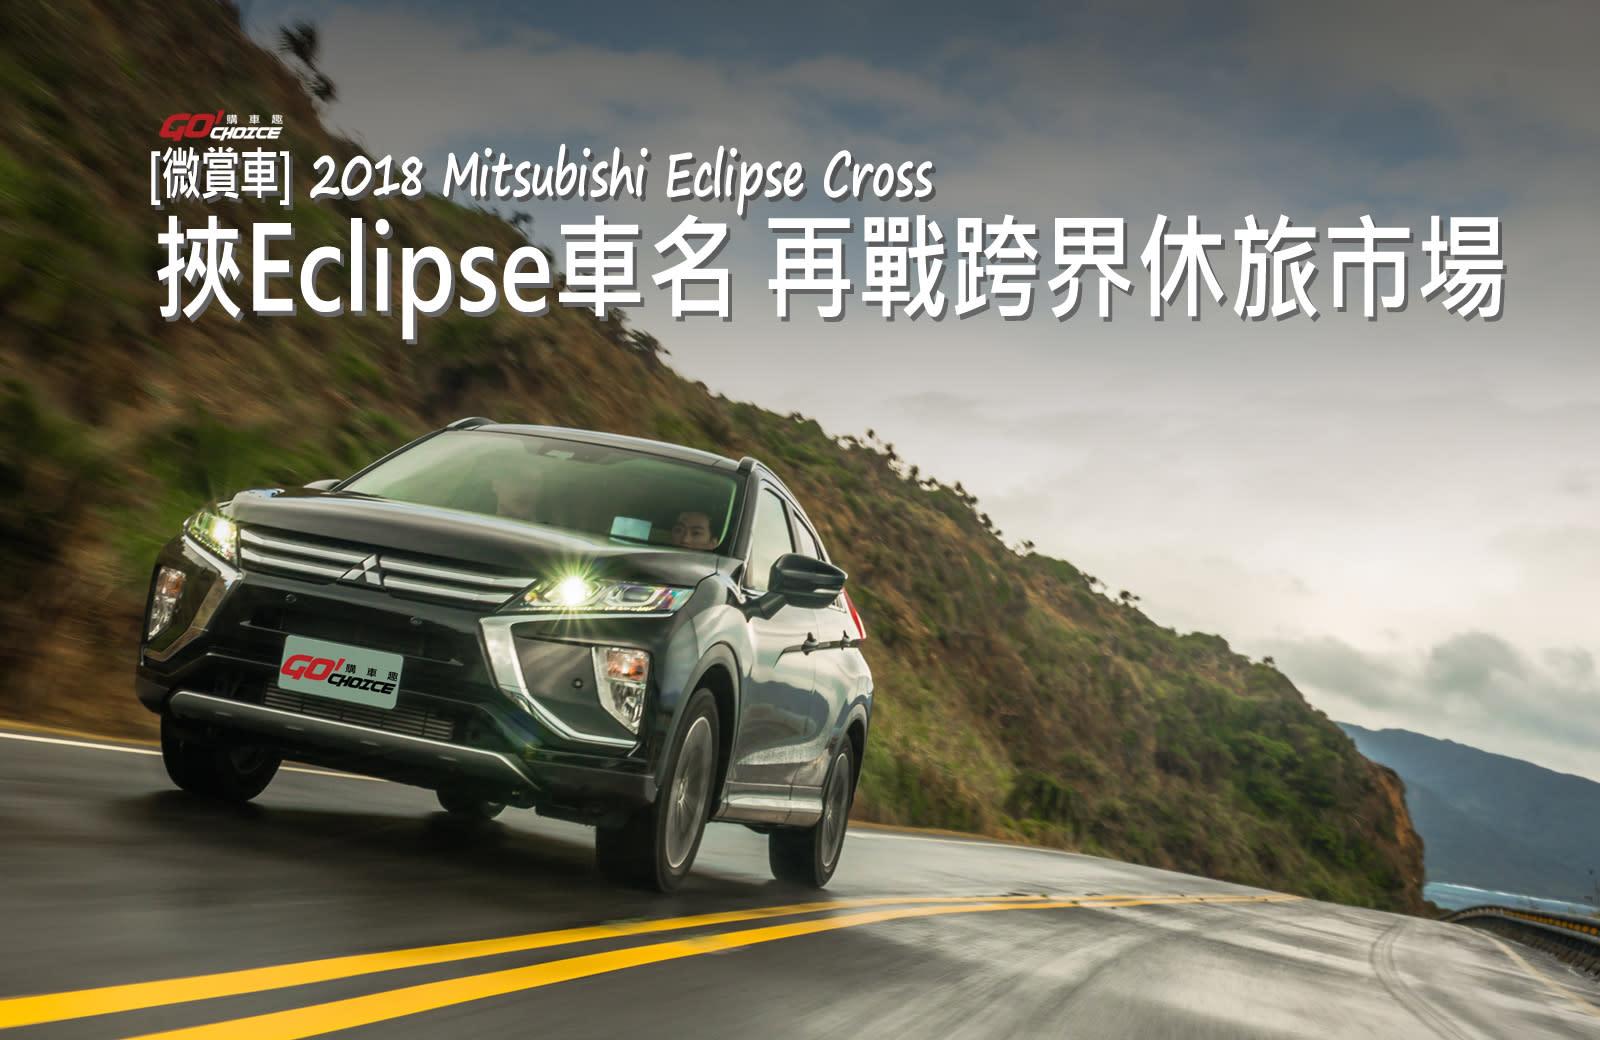 【GoChoice購車趣】2018 Mitsubishi Eclipse Cross 挾Eclipse車名 再戰跨界休旅市場